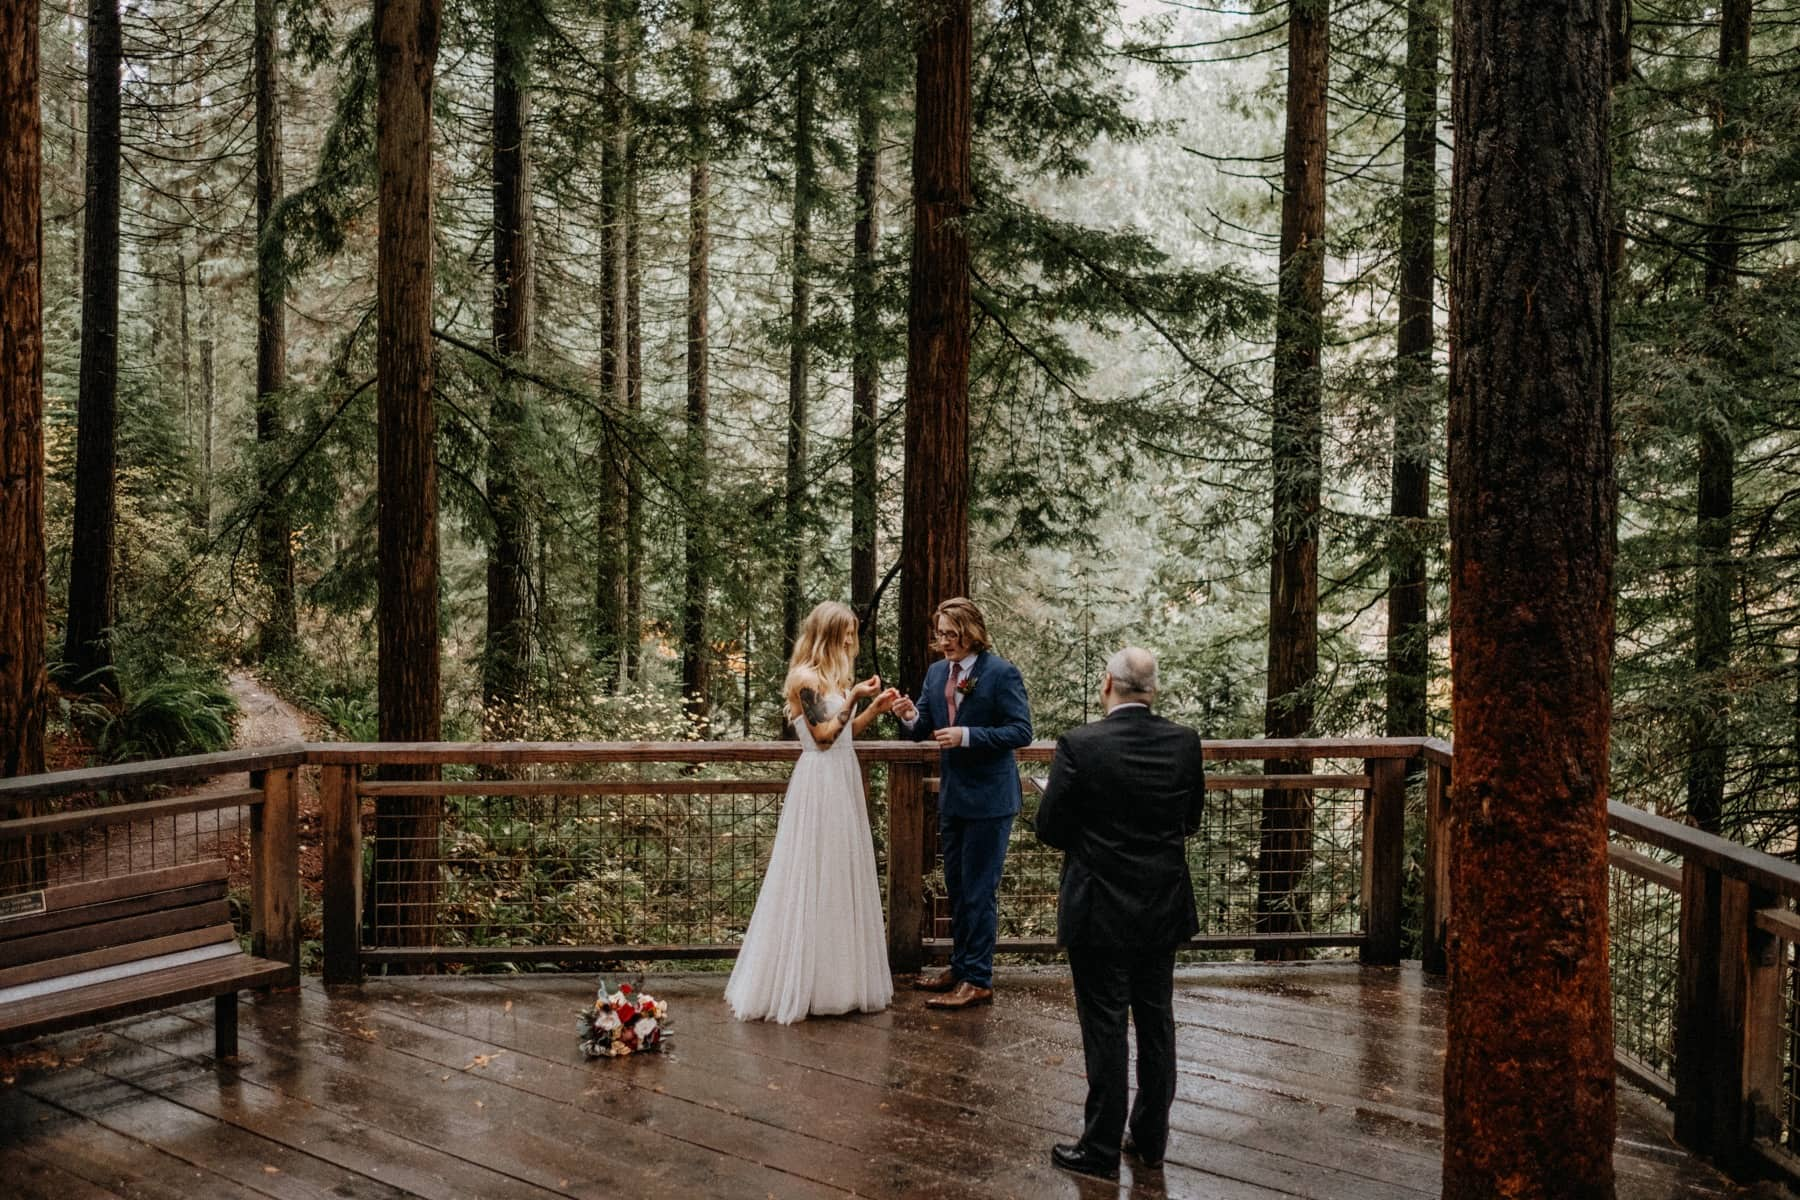 redwood deck hoyt arboretum wedding ceremony photo